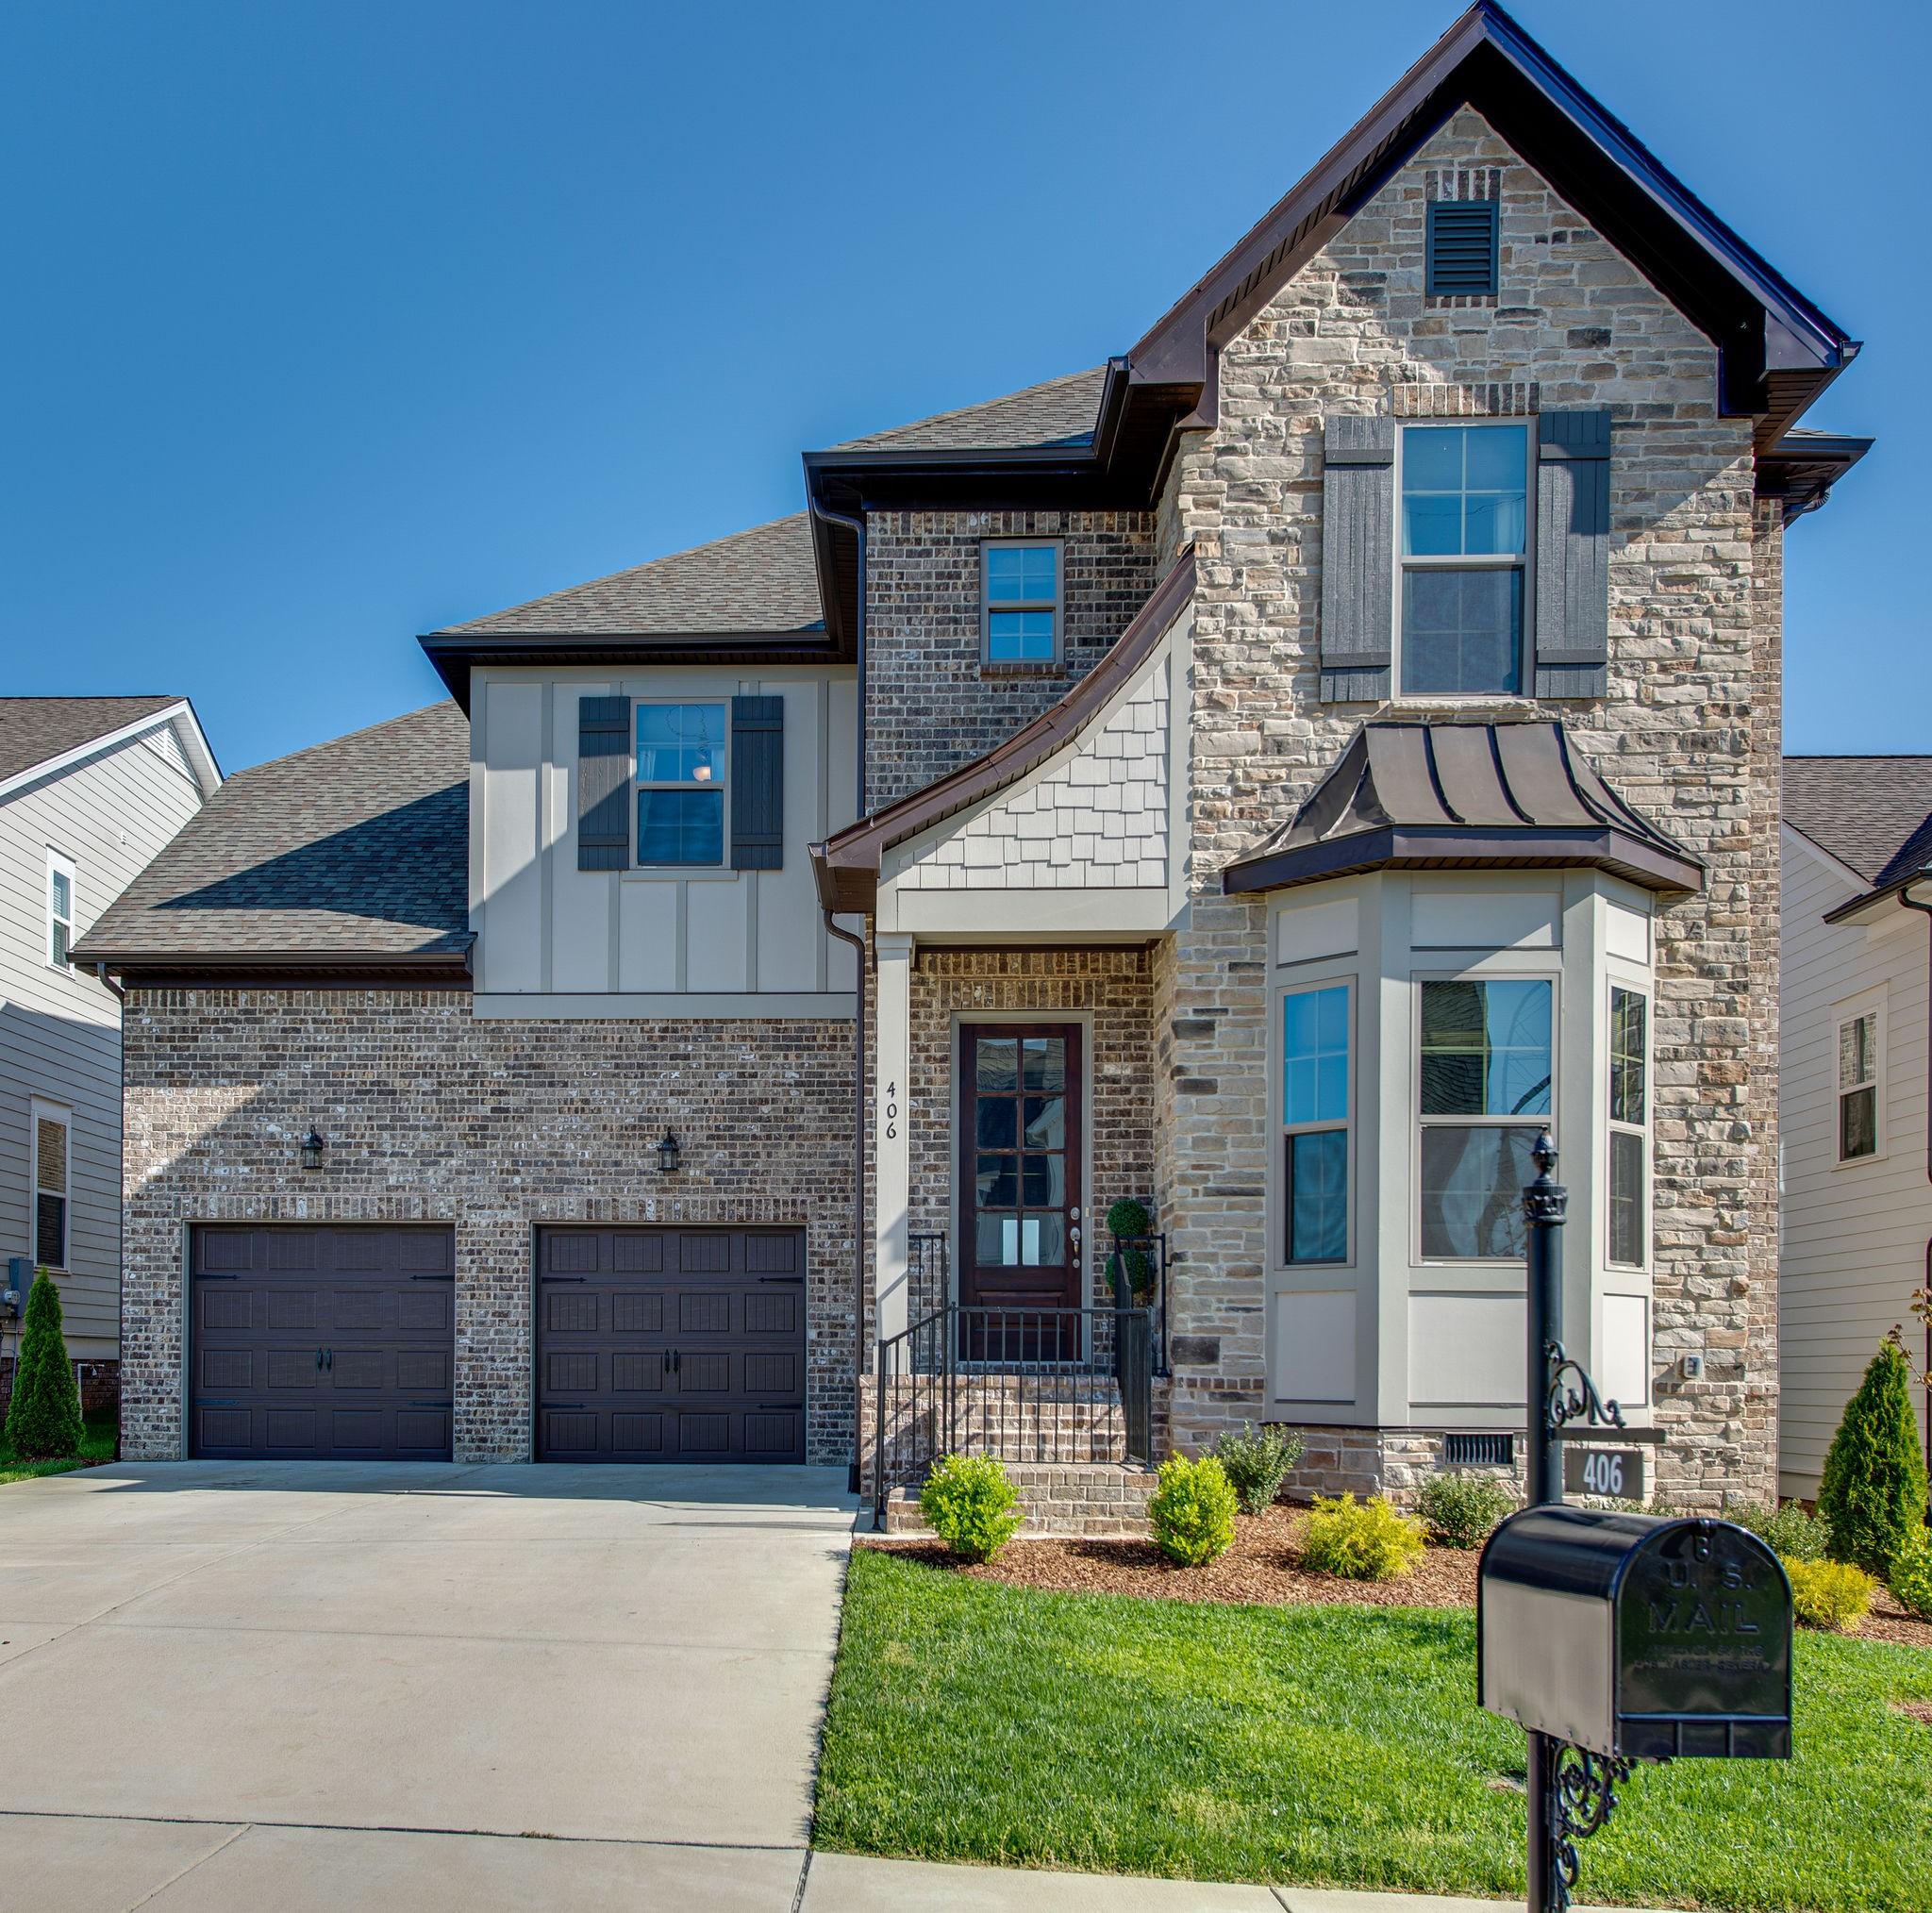 406 River Bluff Dr, Franklin, TN 37064 - Franklin, TN real estate listing